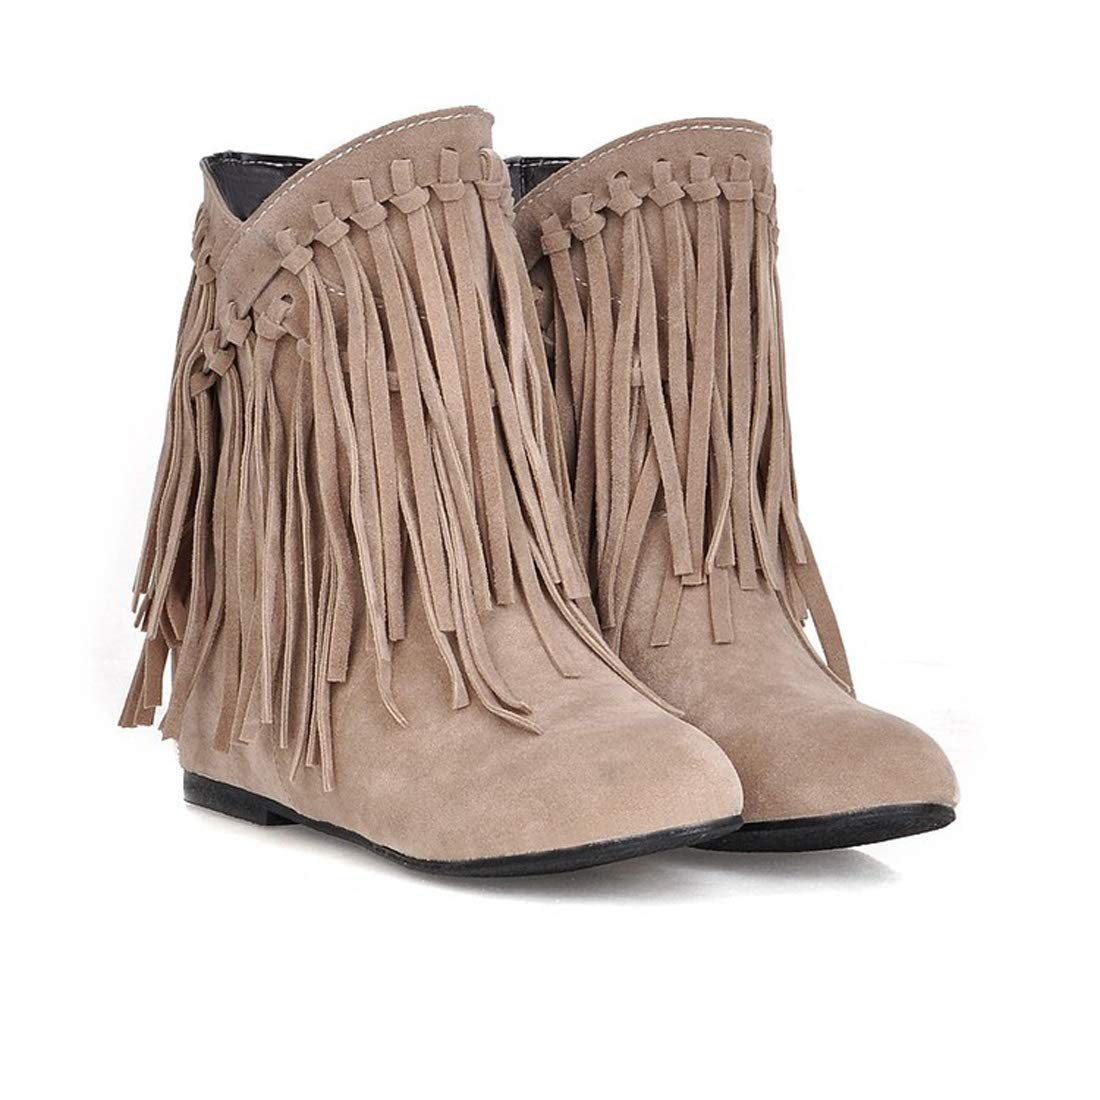 DANDANJIE Damenschuhe Knöchelstiefel Fallen Winter Stiefelie Tassel Flache Ferse Runde Zehen-Stiefelies